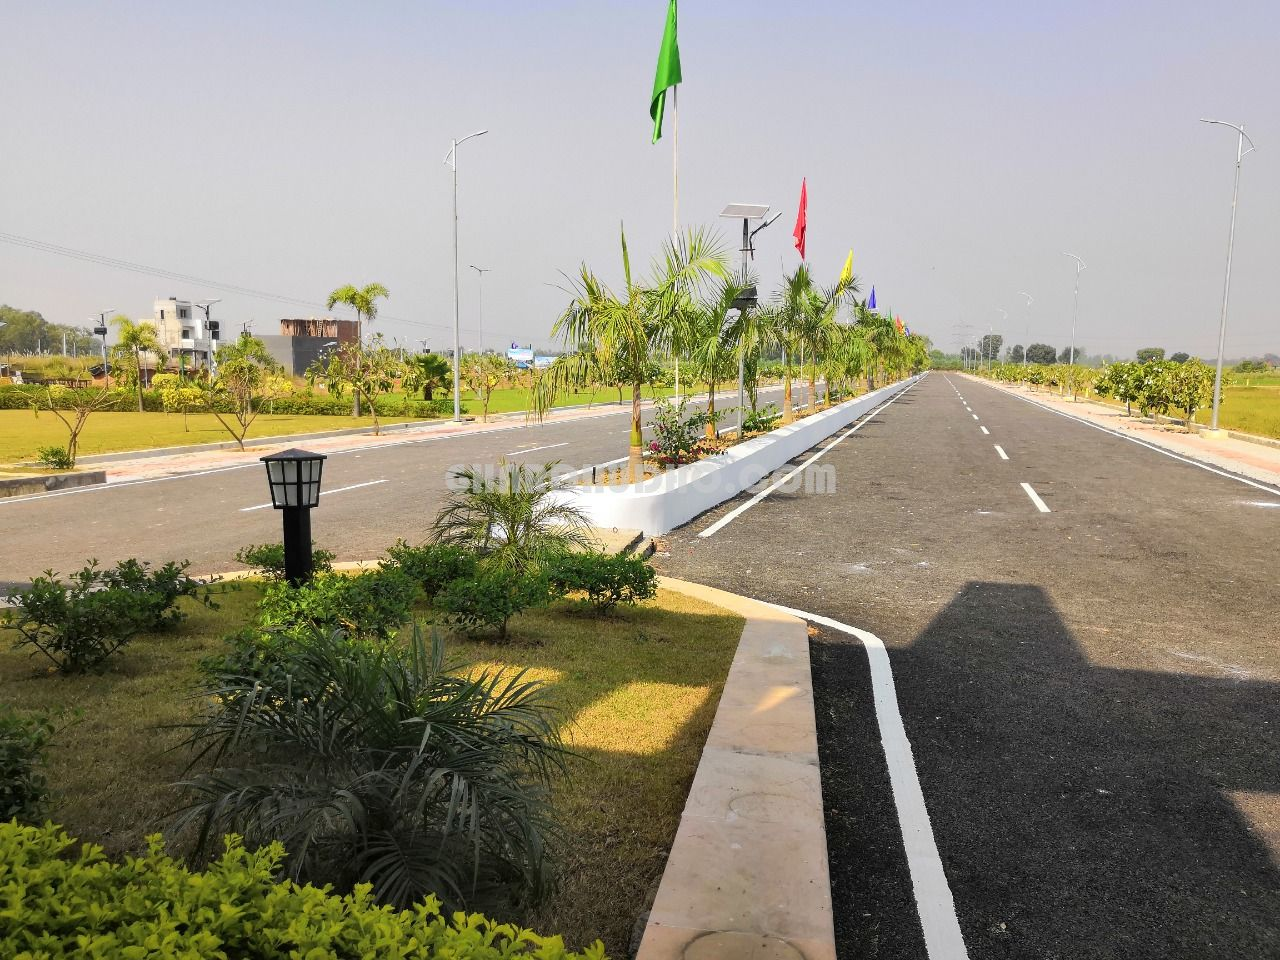 Lucknow Greens